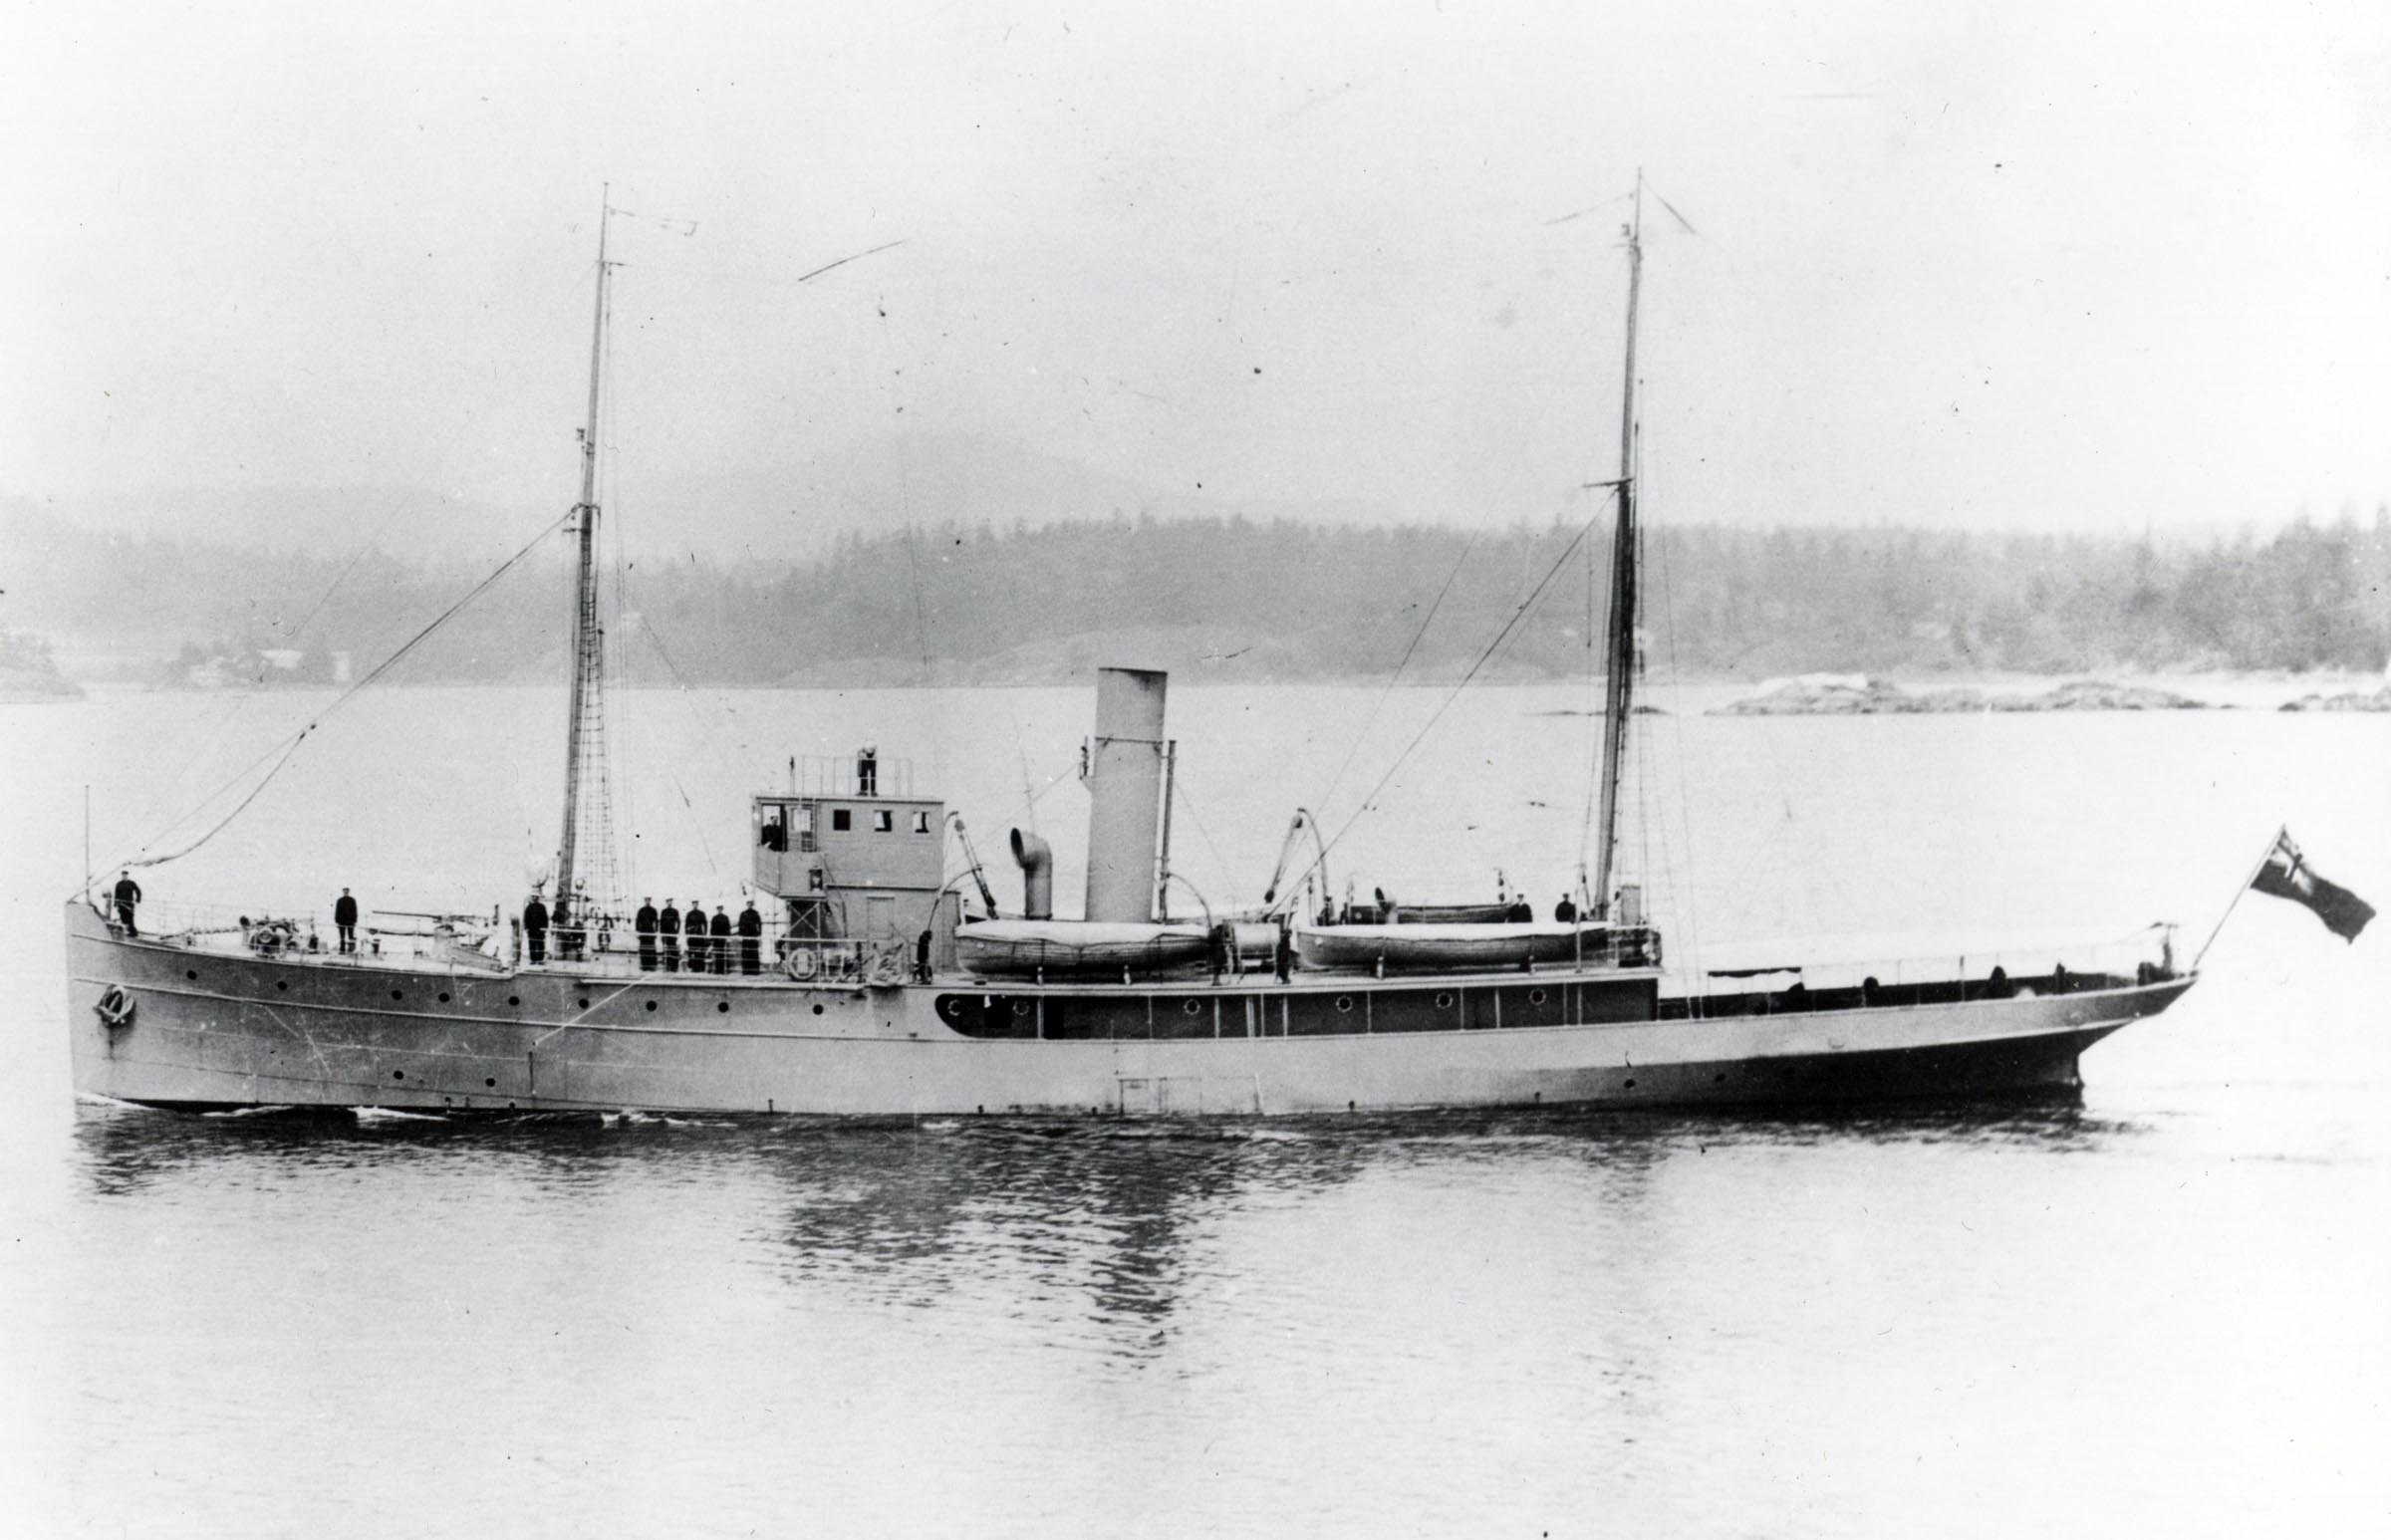 HMCS MALASPINA